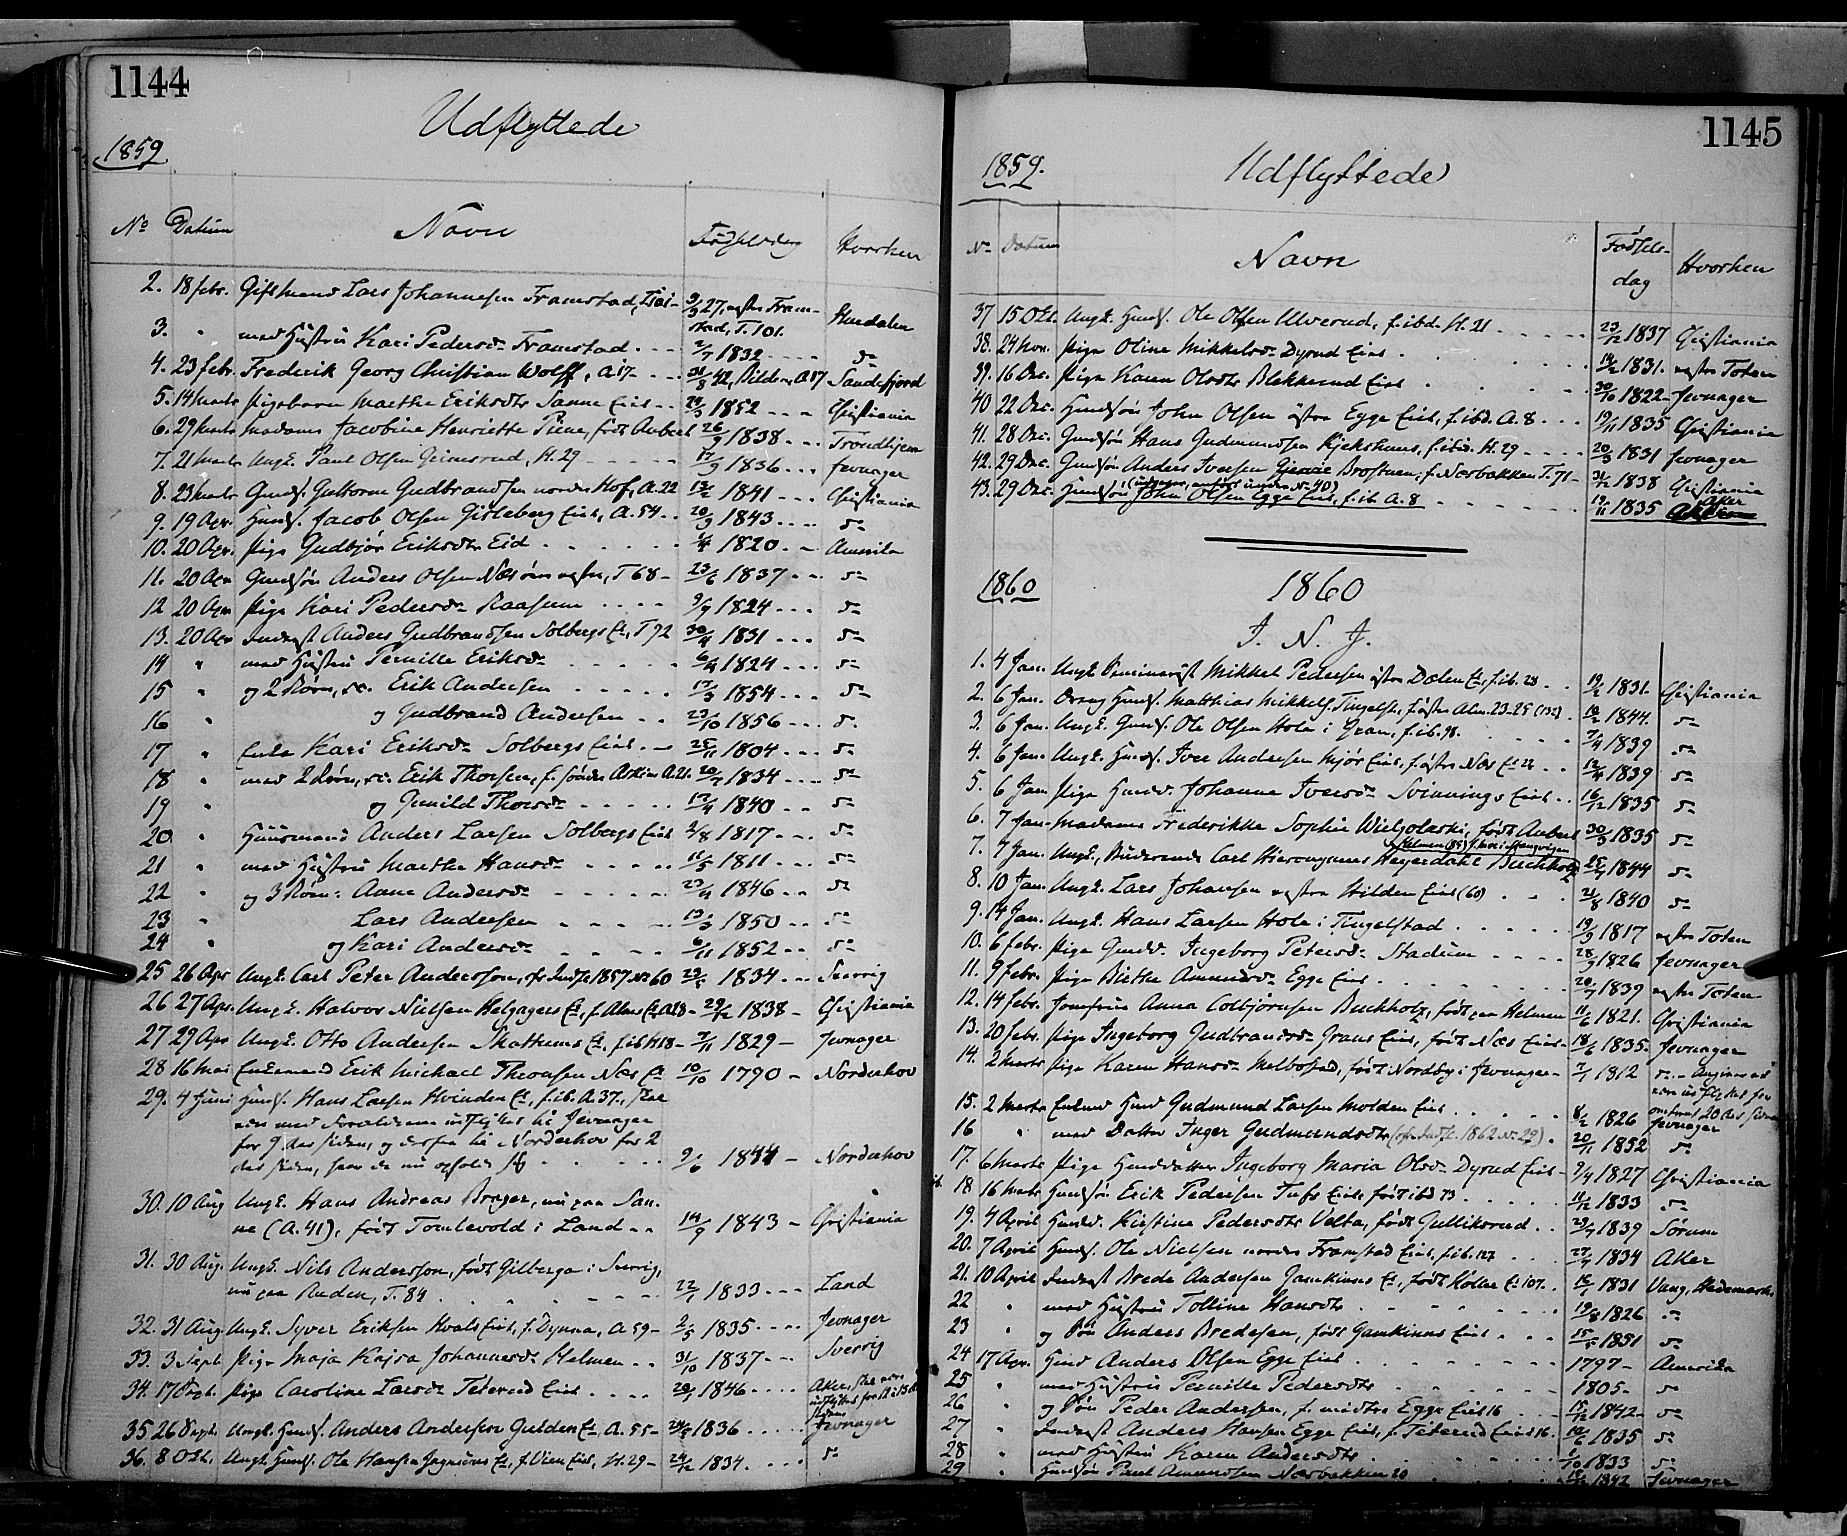 SAH, Gran prestekontor, Ministerialbok nr. 12, 1856-1874, s. 1144-1145